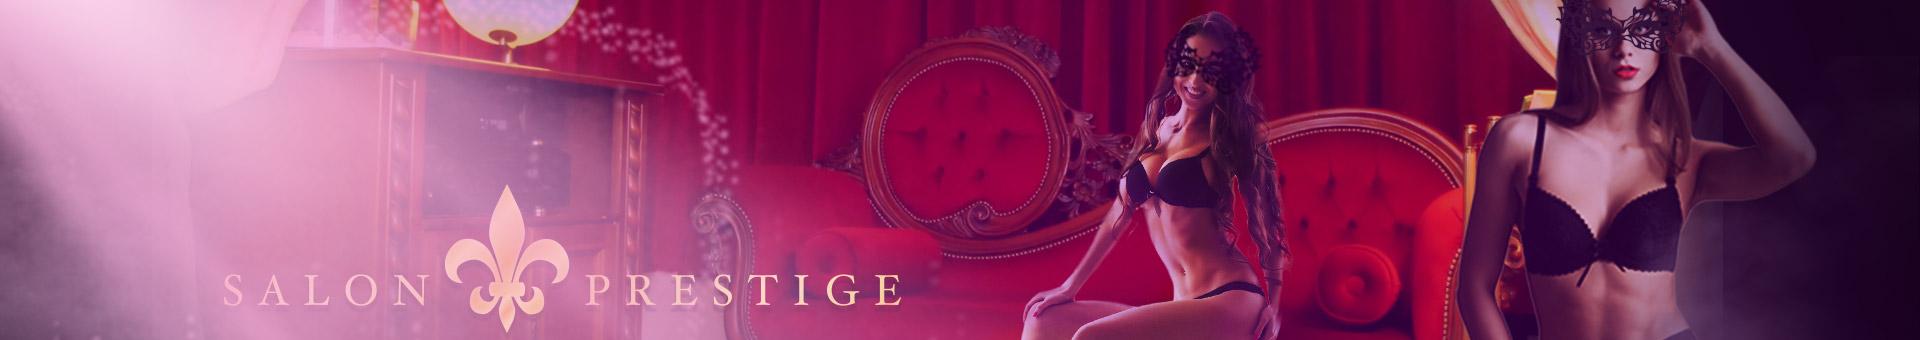 Banner - Salon Prestige